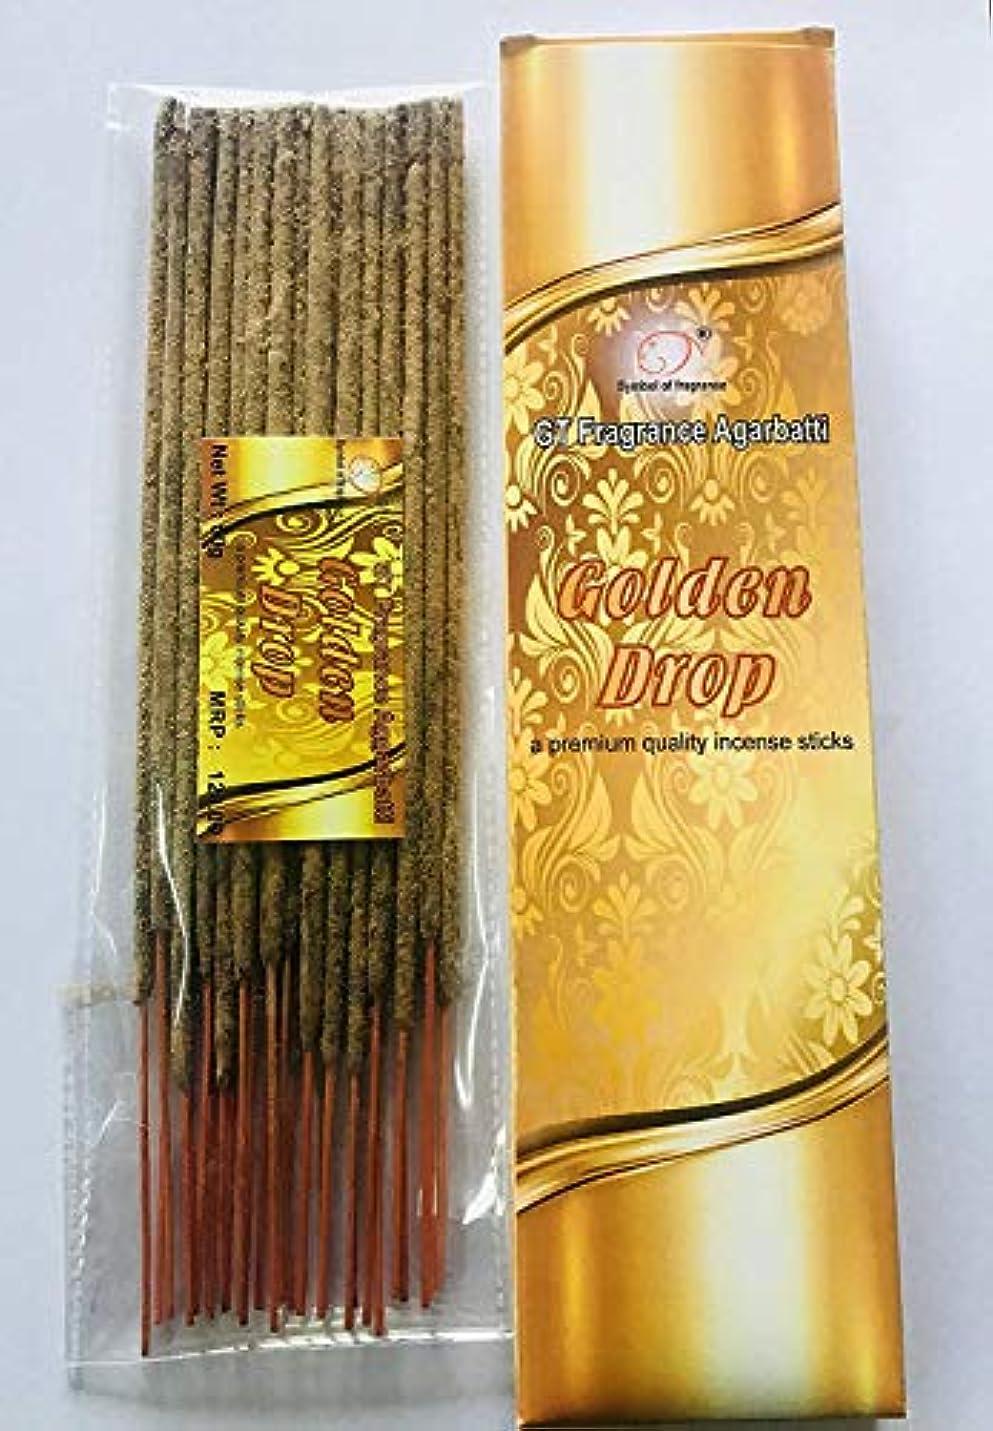 断線降雨通常Golden Drop. Bundle of 2 Packs, a Premium Quality Incense sticks-100g